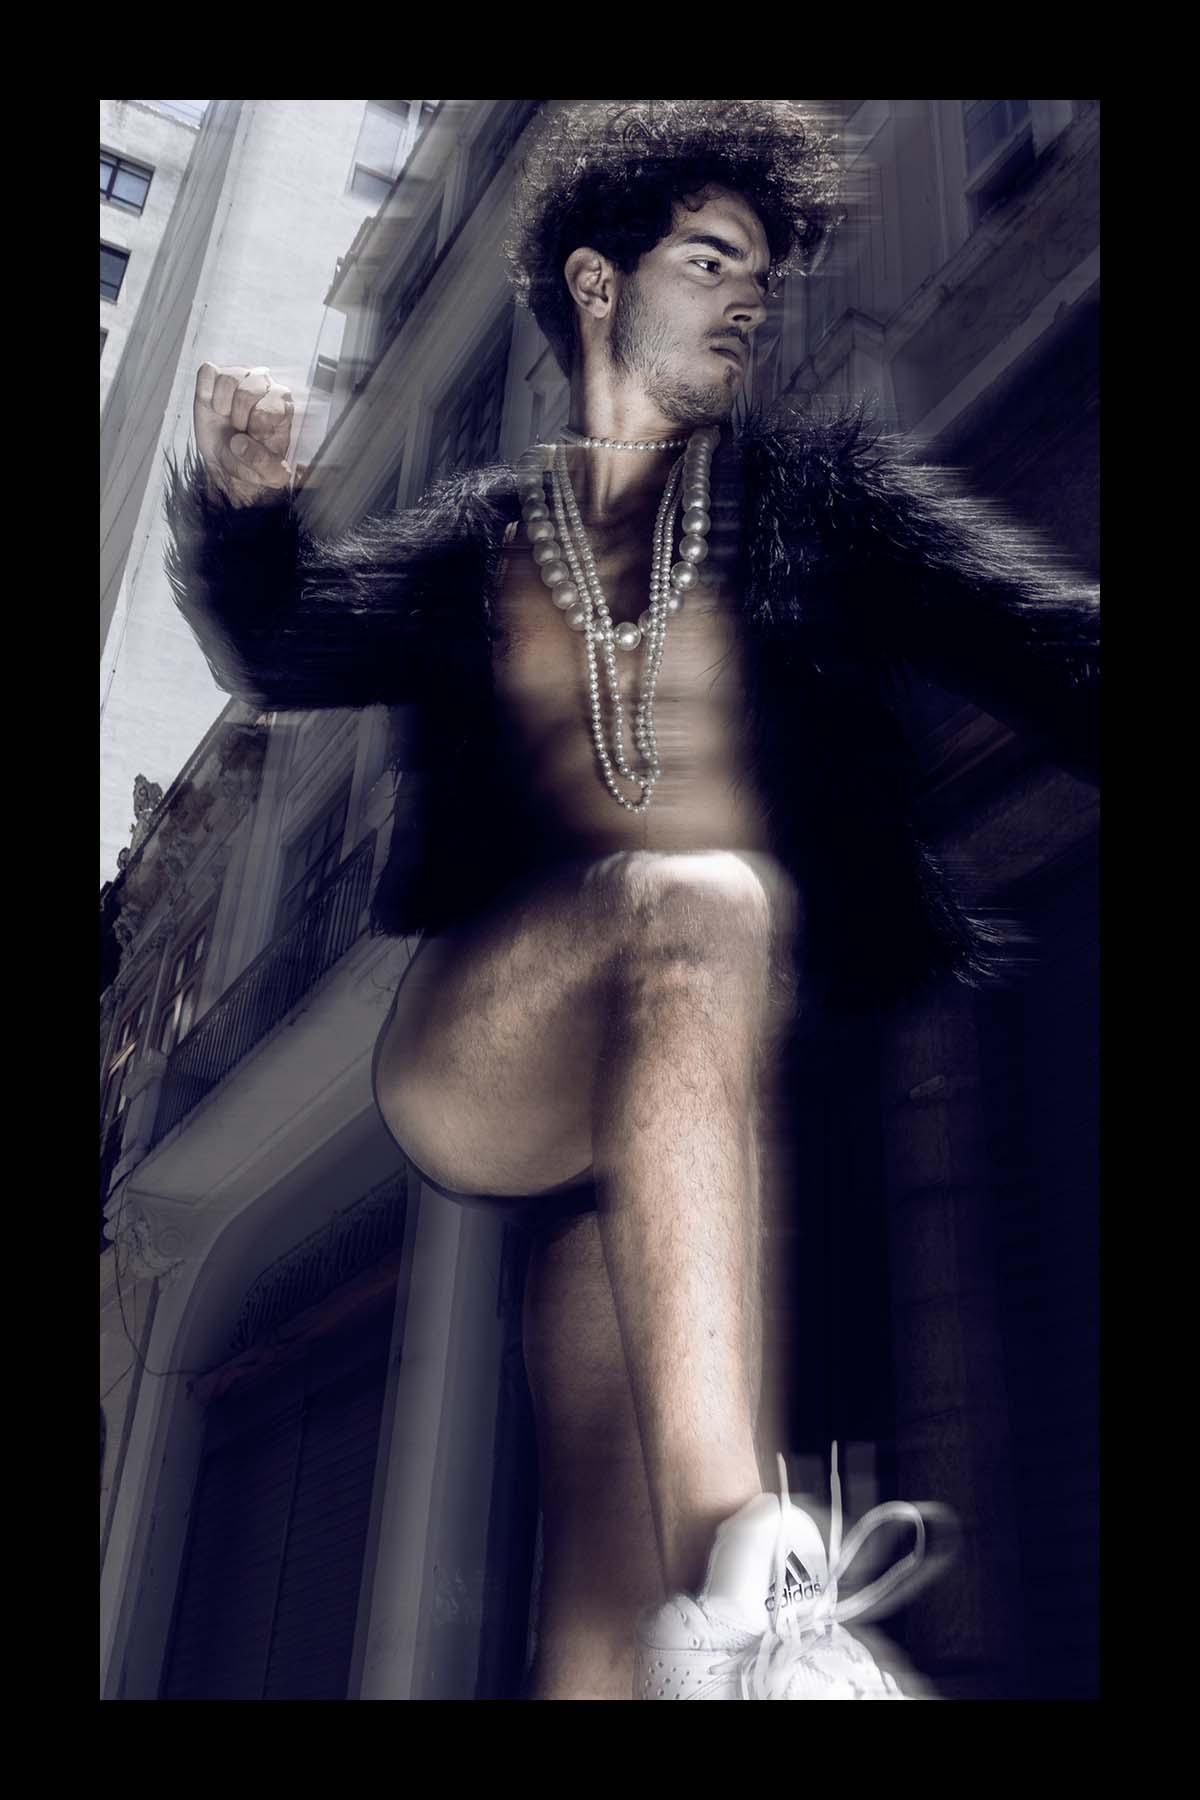 Bruno Brabieri by Matheus Muraca for Brazilian Male Model